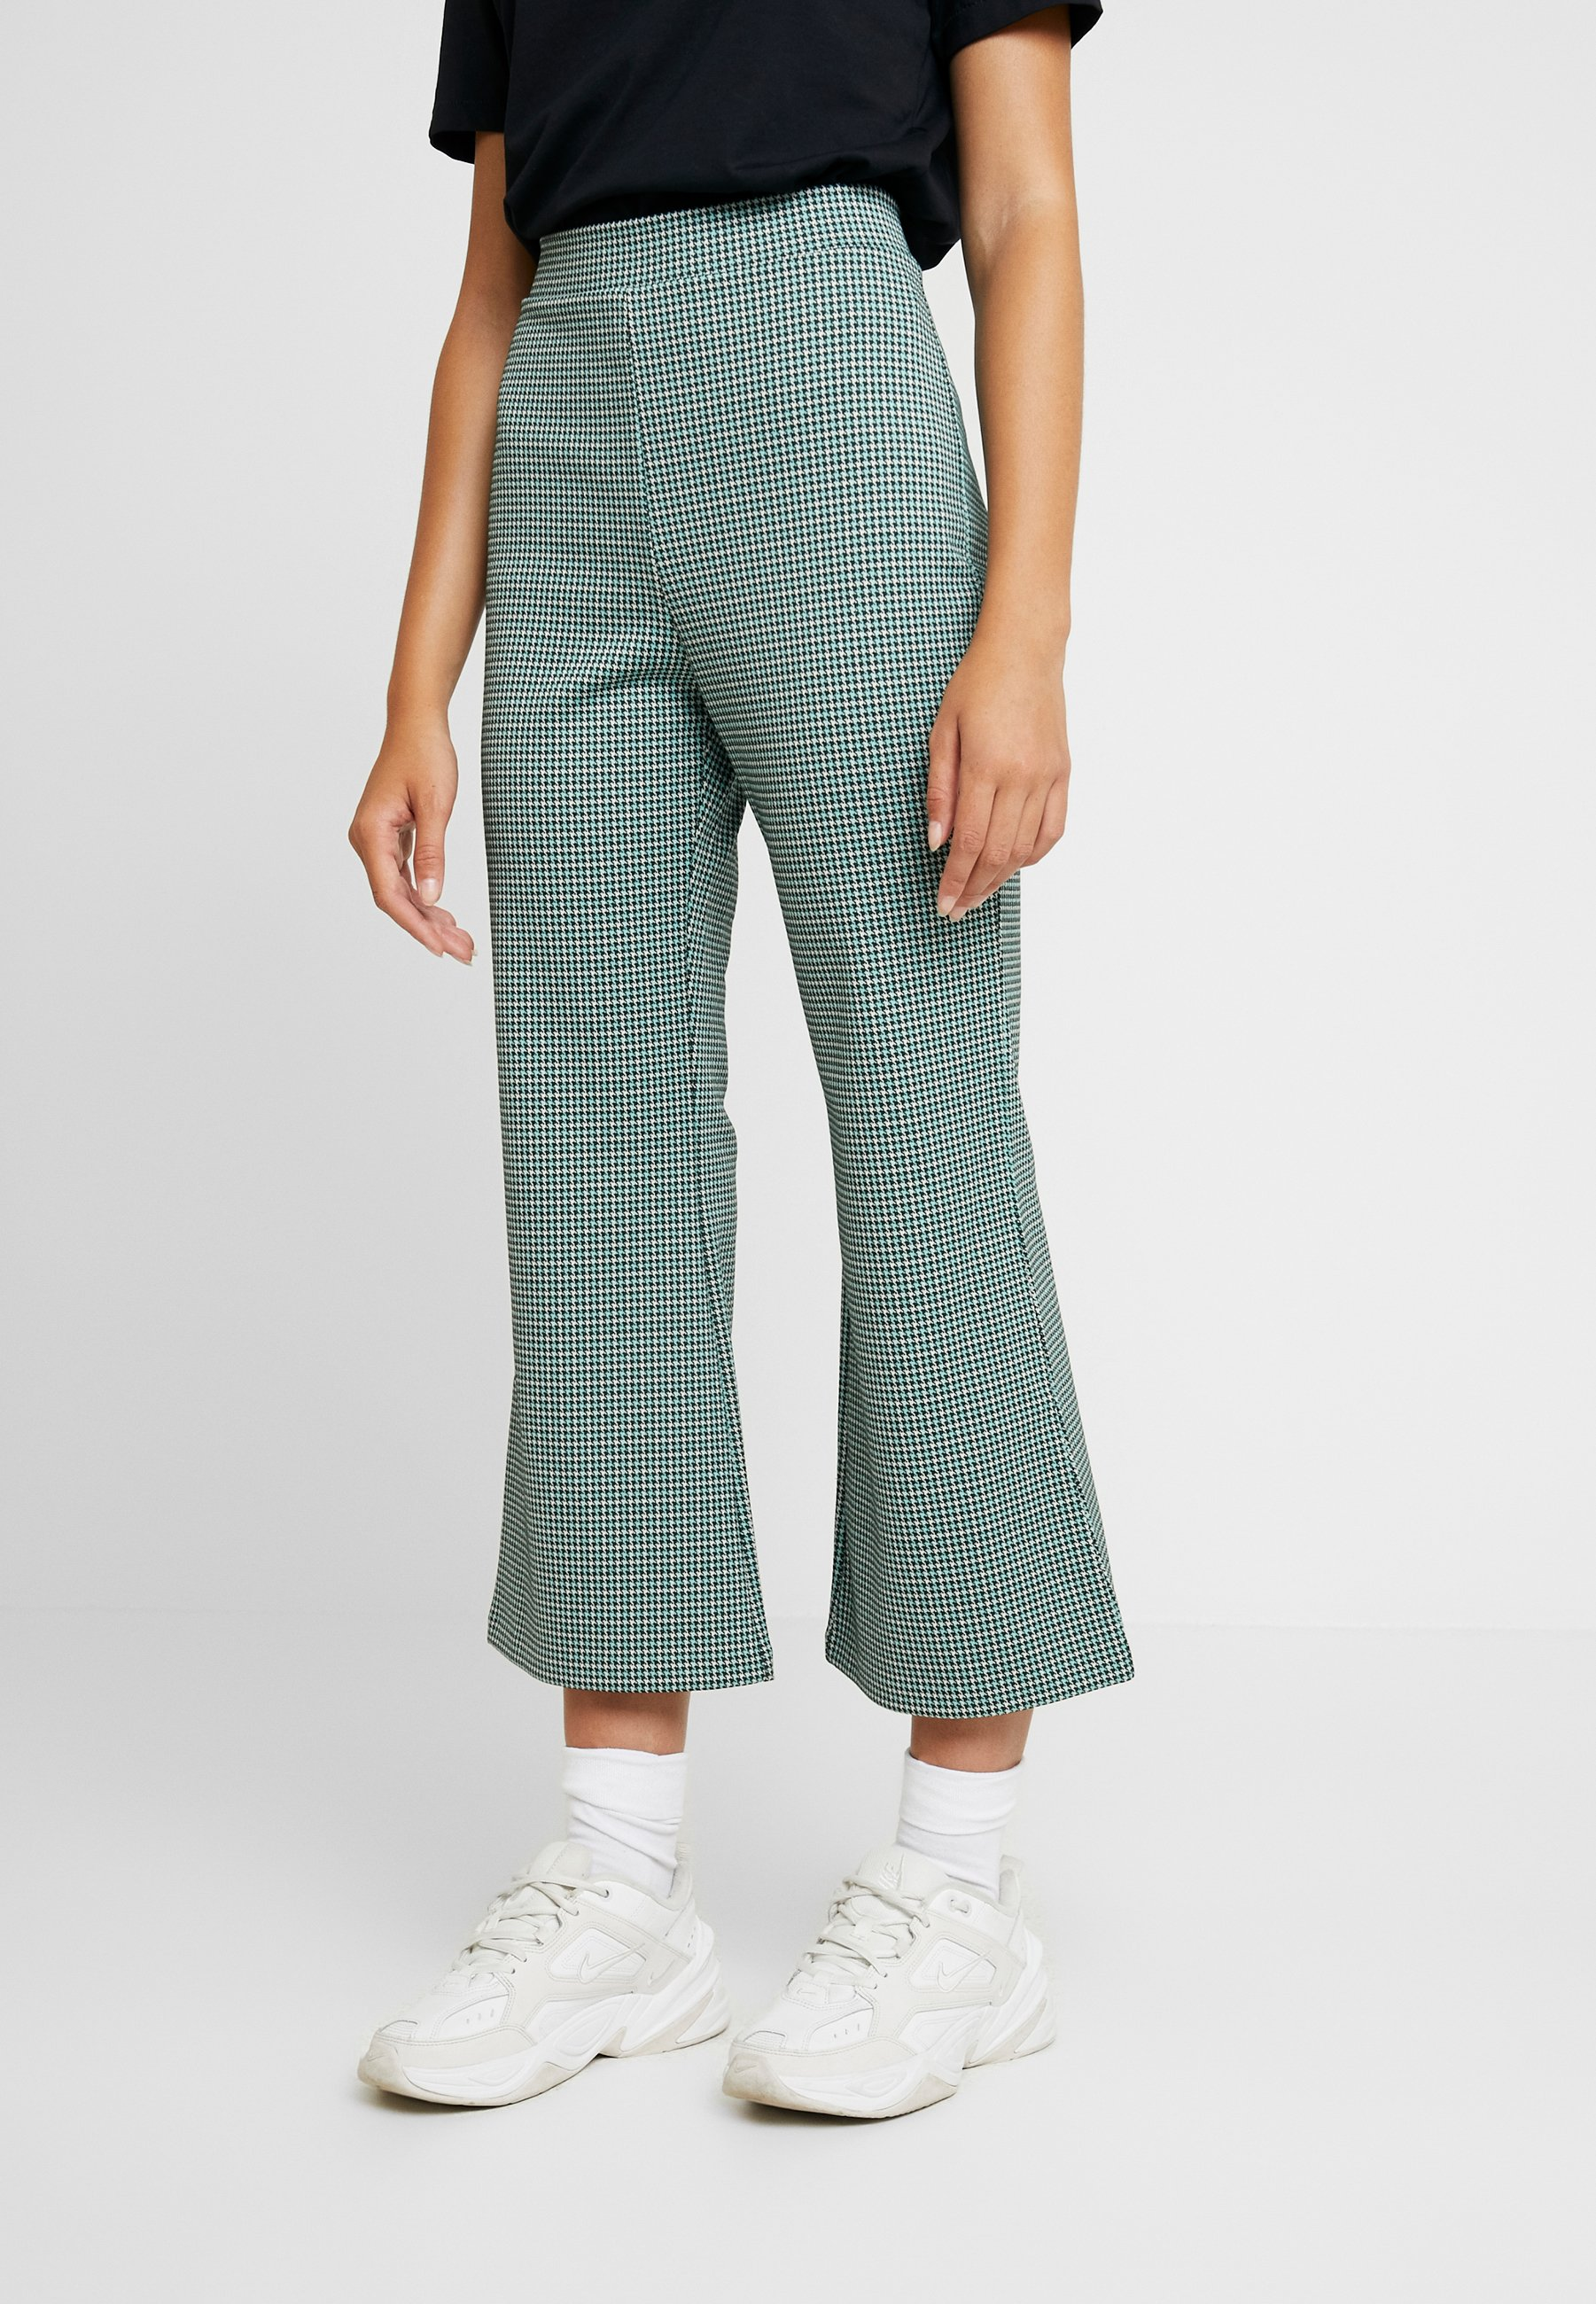 Mint Monki Monki Classique Starlet TrousersPantalon Starlet Mint TrousersPantalon Starlet Monki Classique wiuPlXOTkZ